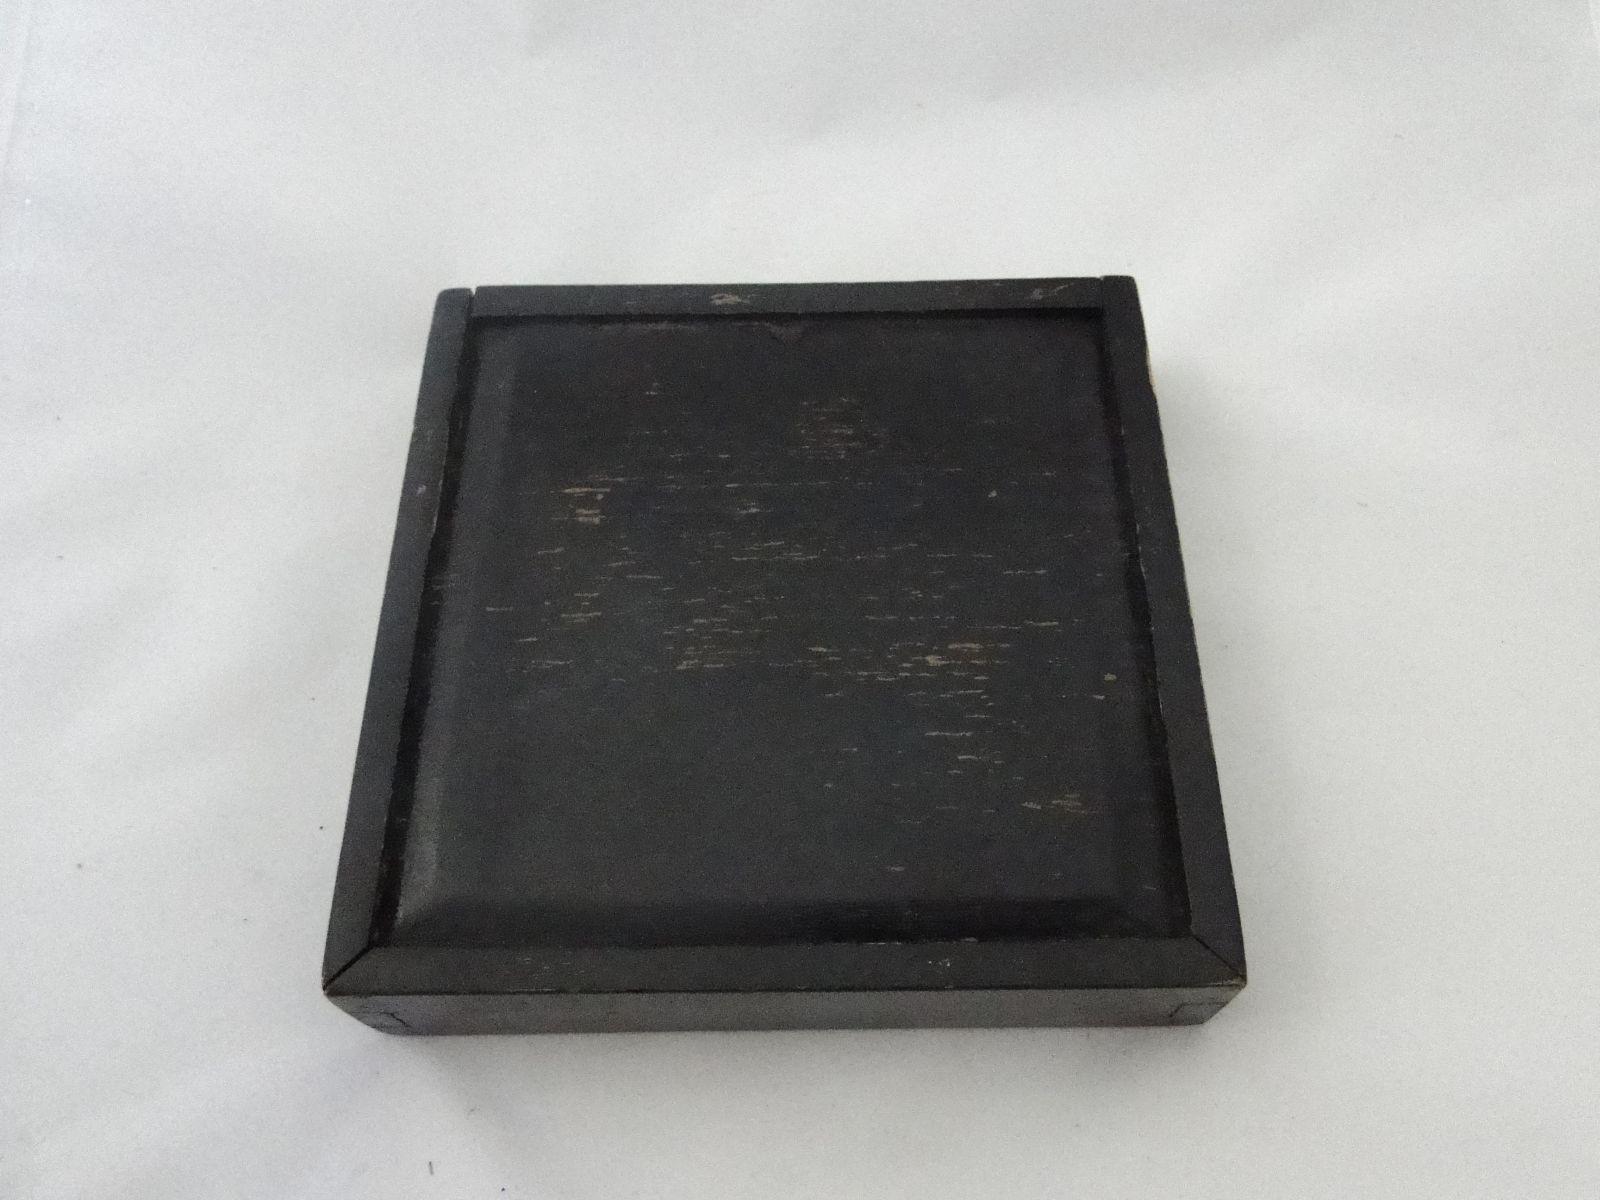 DSC06438.JPG (1600×1200)